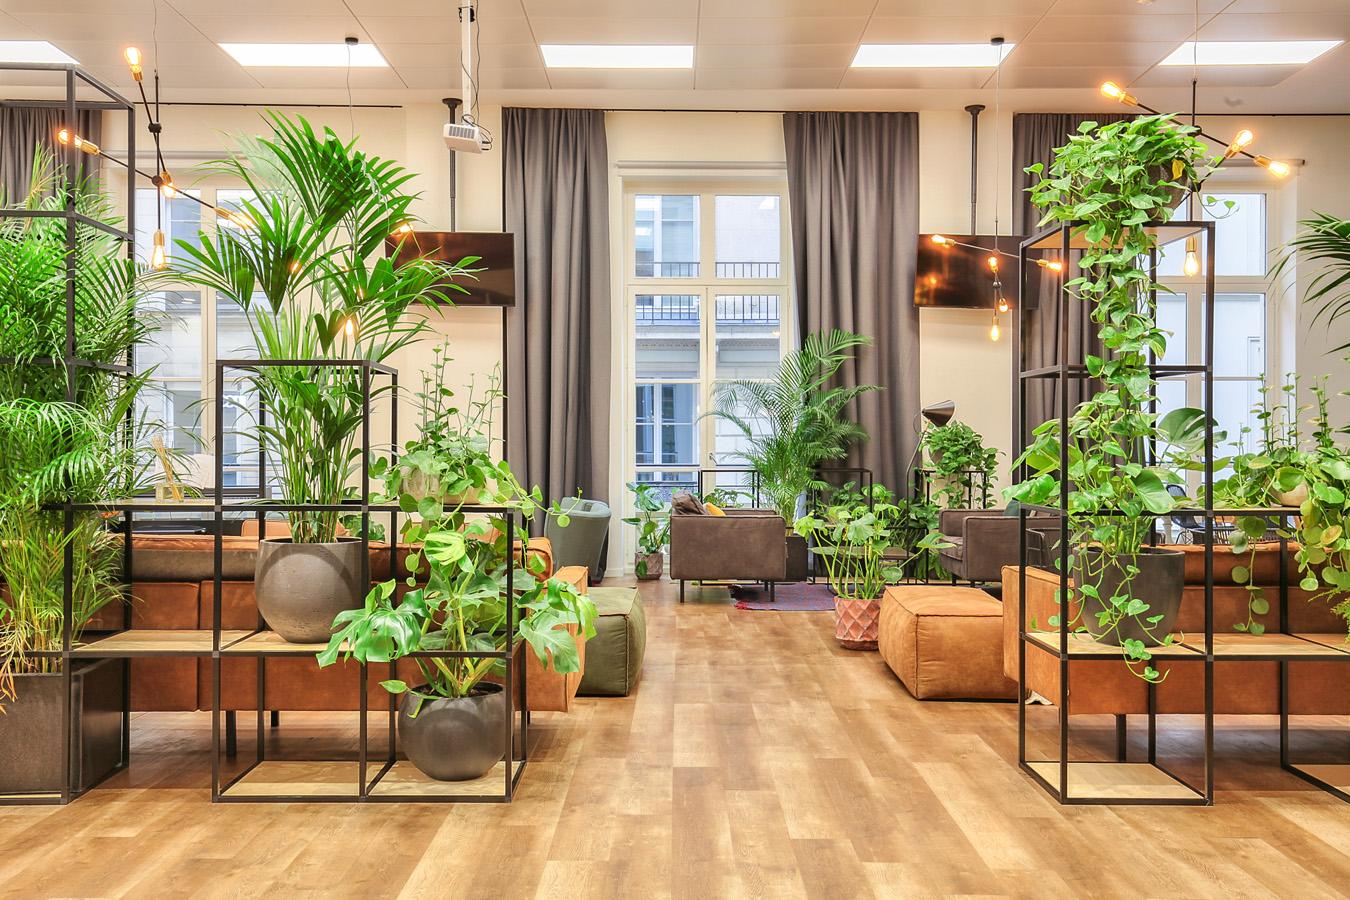 nicolas vade - architecture interieur - bureaux design - Aircall - salon 1.jpg